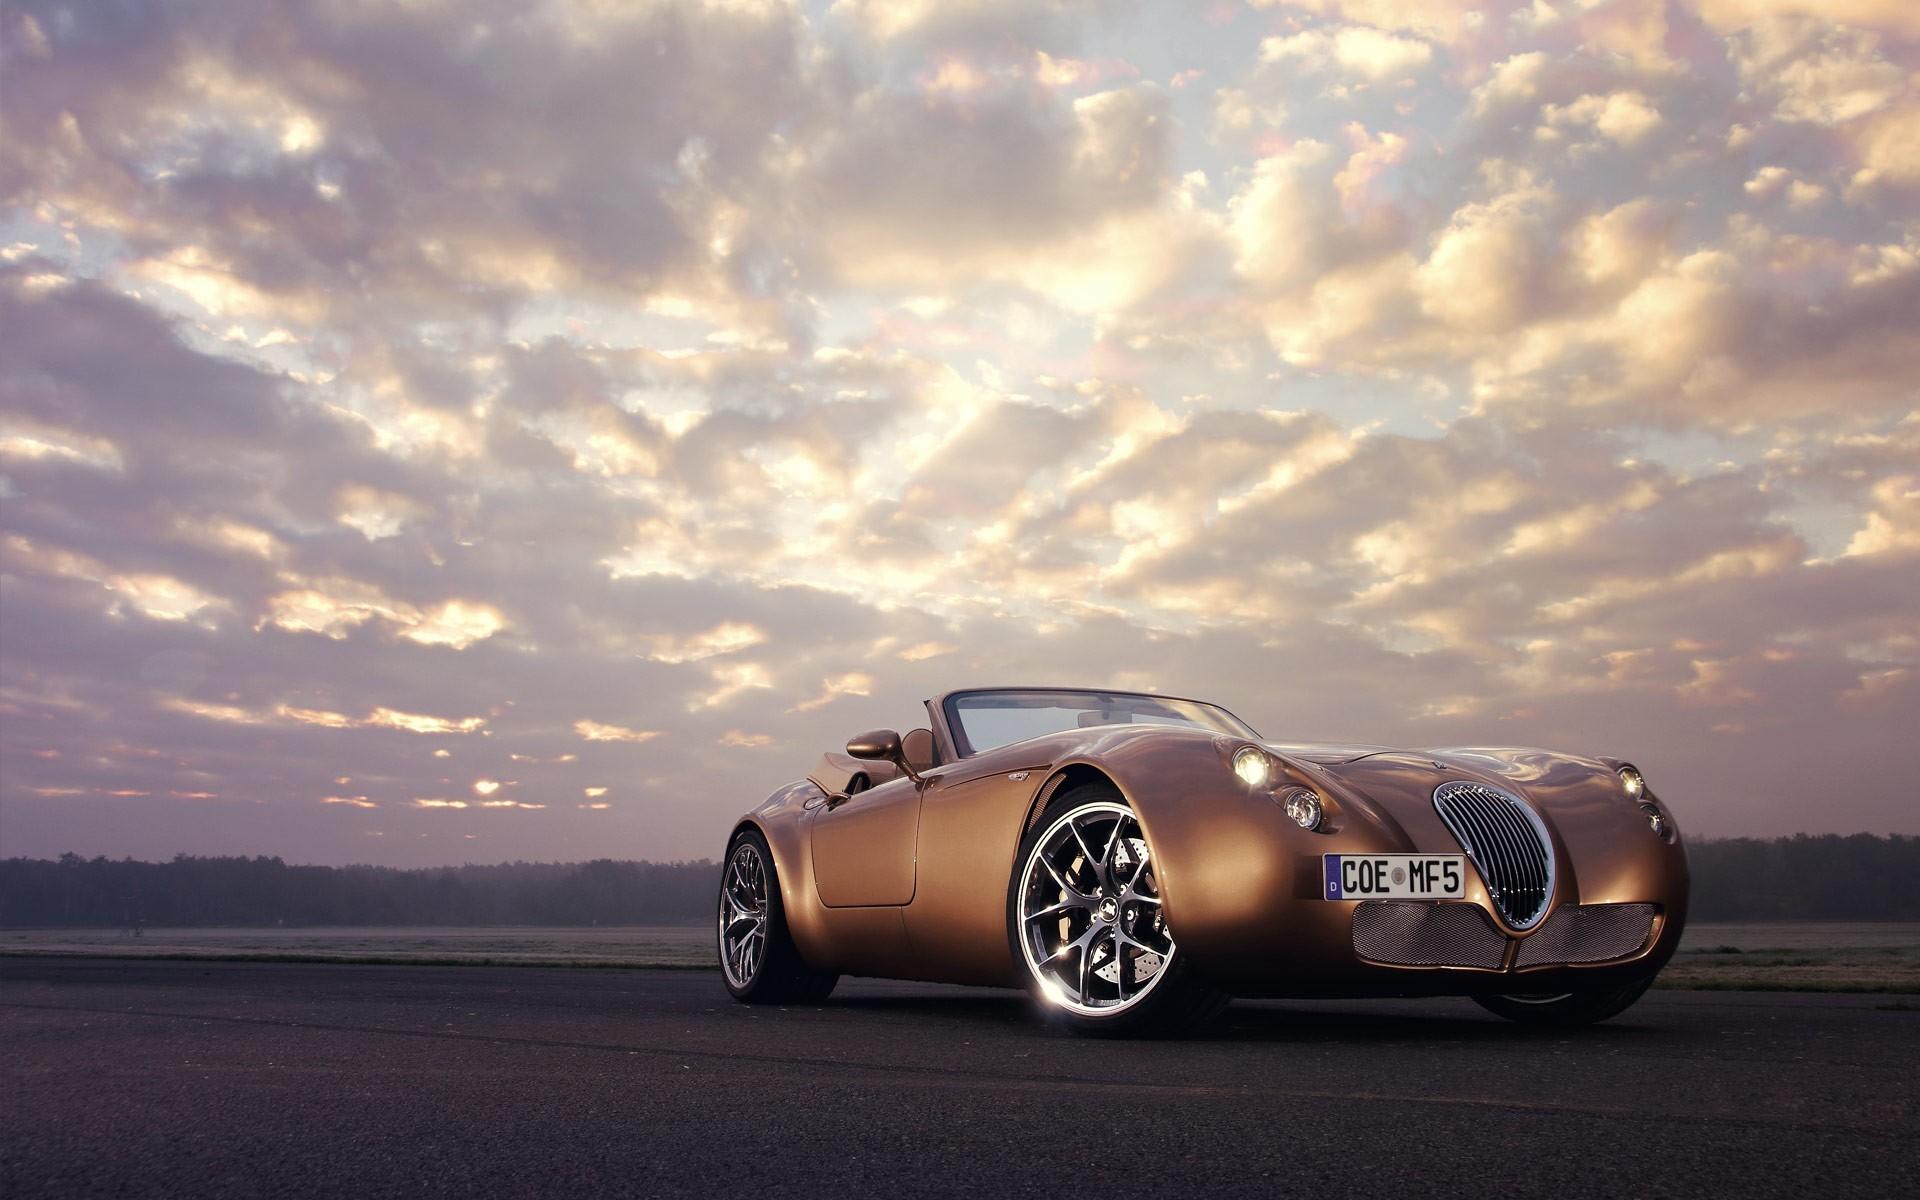 Res: 1920x1200, Golden Vintage Car